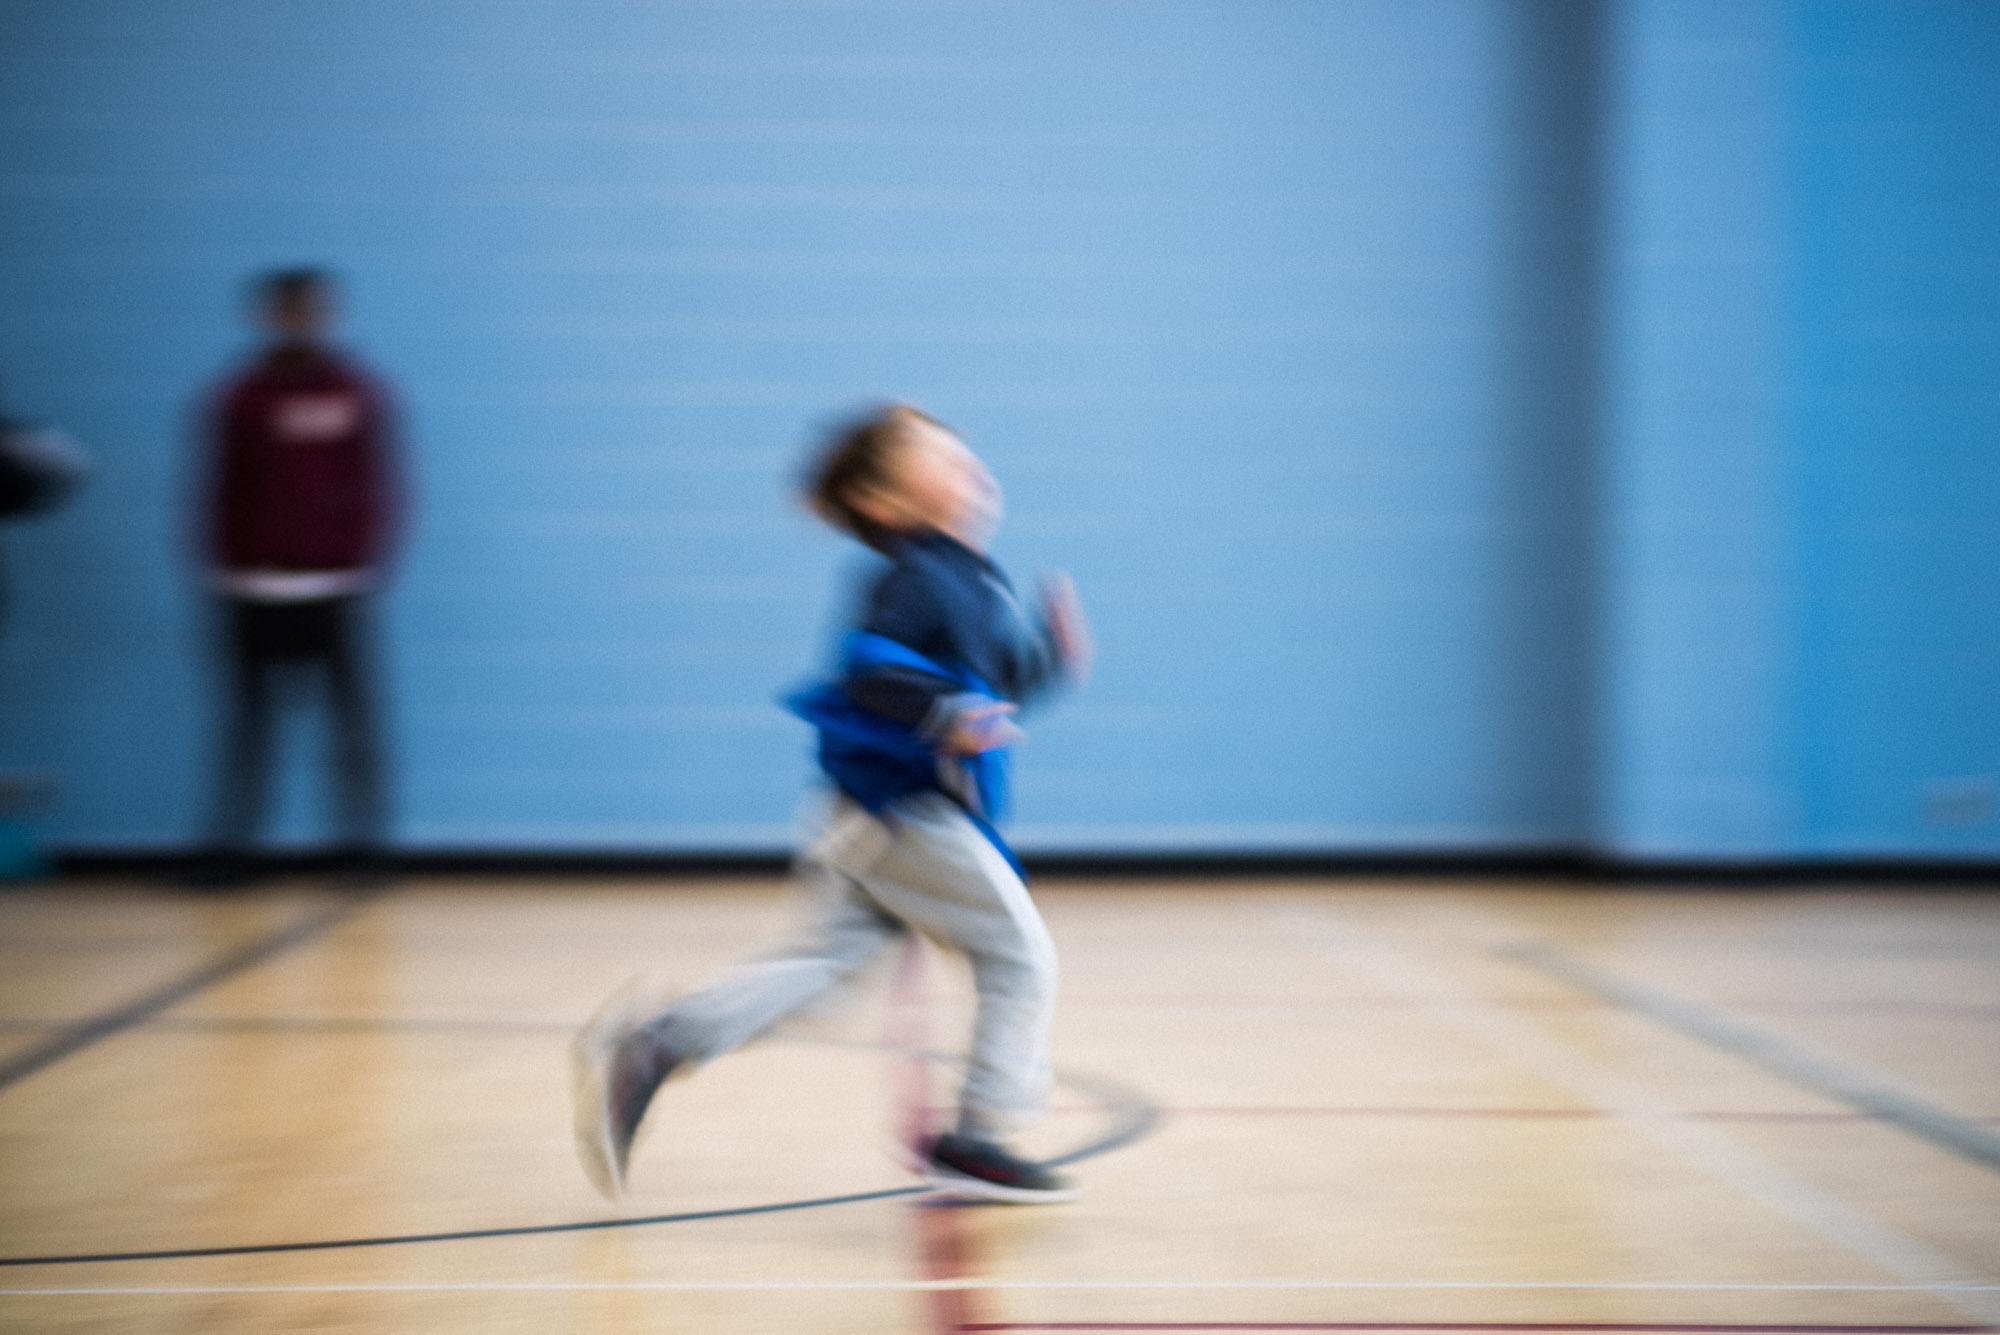 motion blur boy runs at soccer practice dressed in blue bib